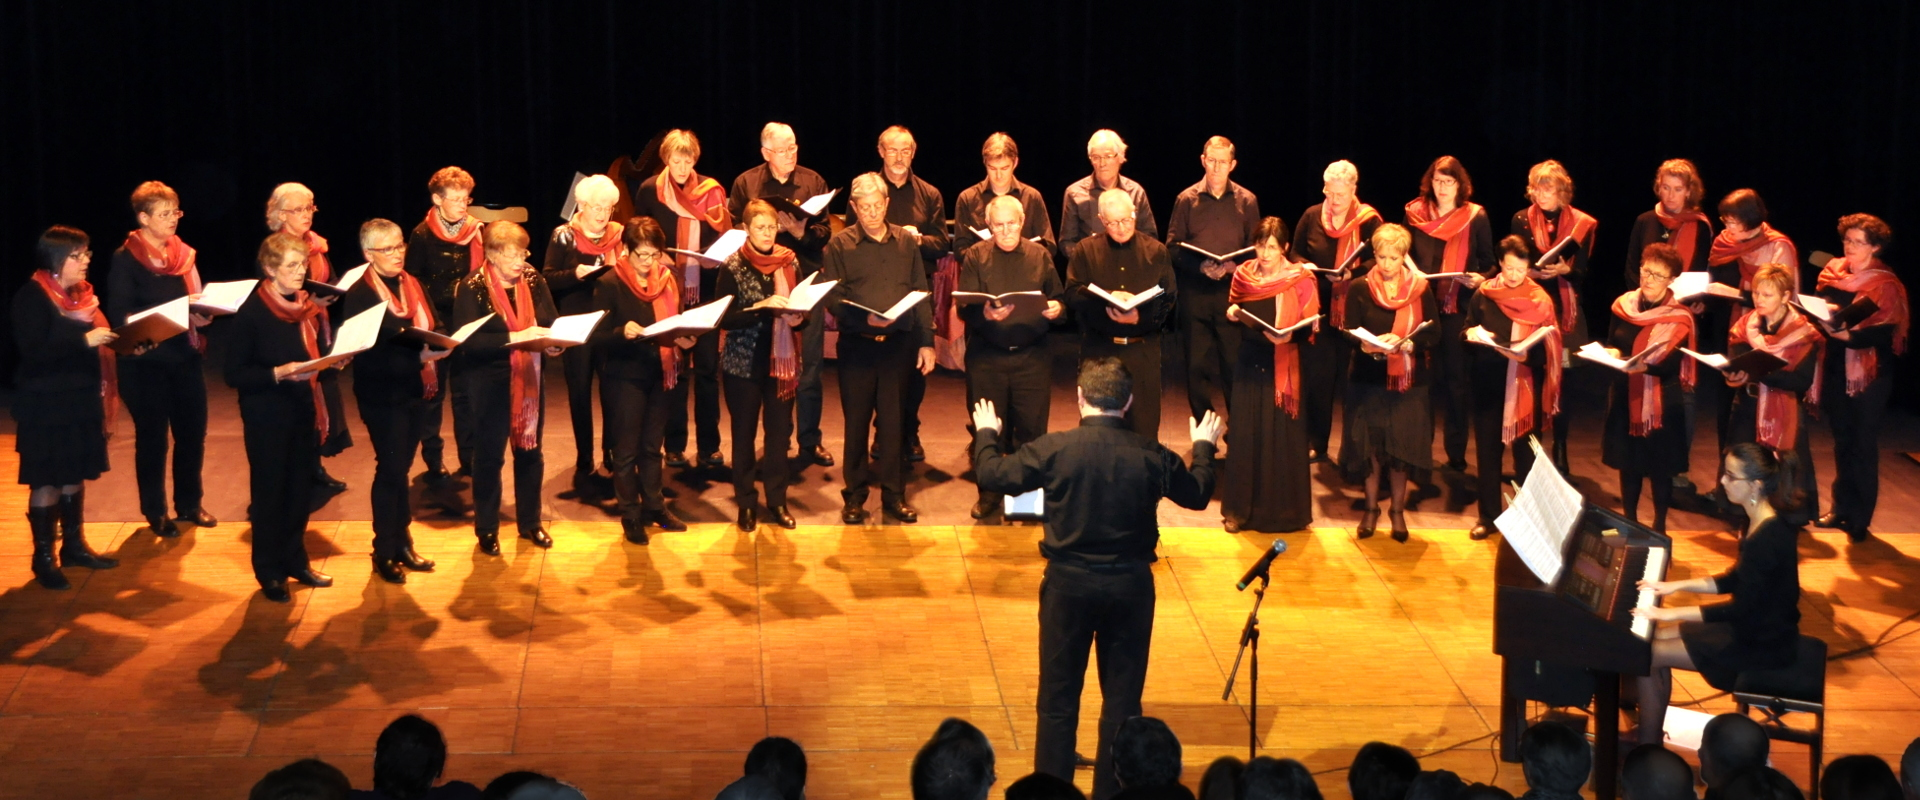 Grand chœur à la Passerelle 2015